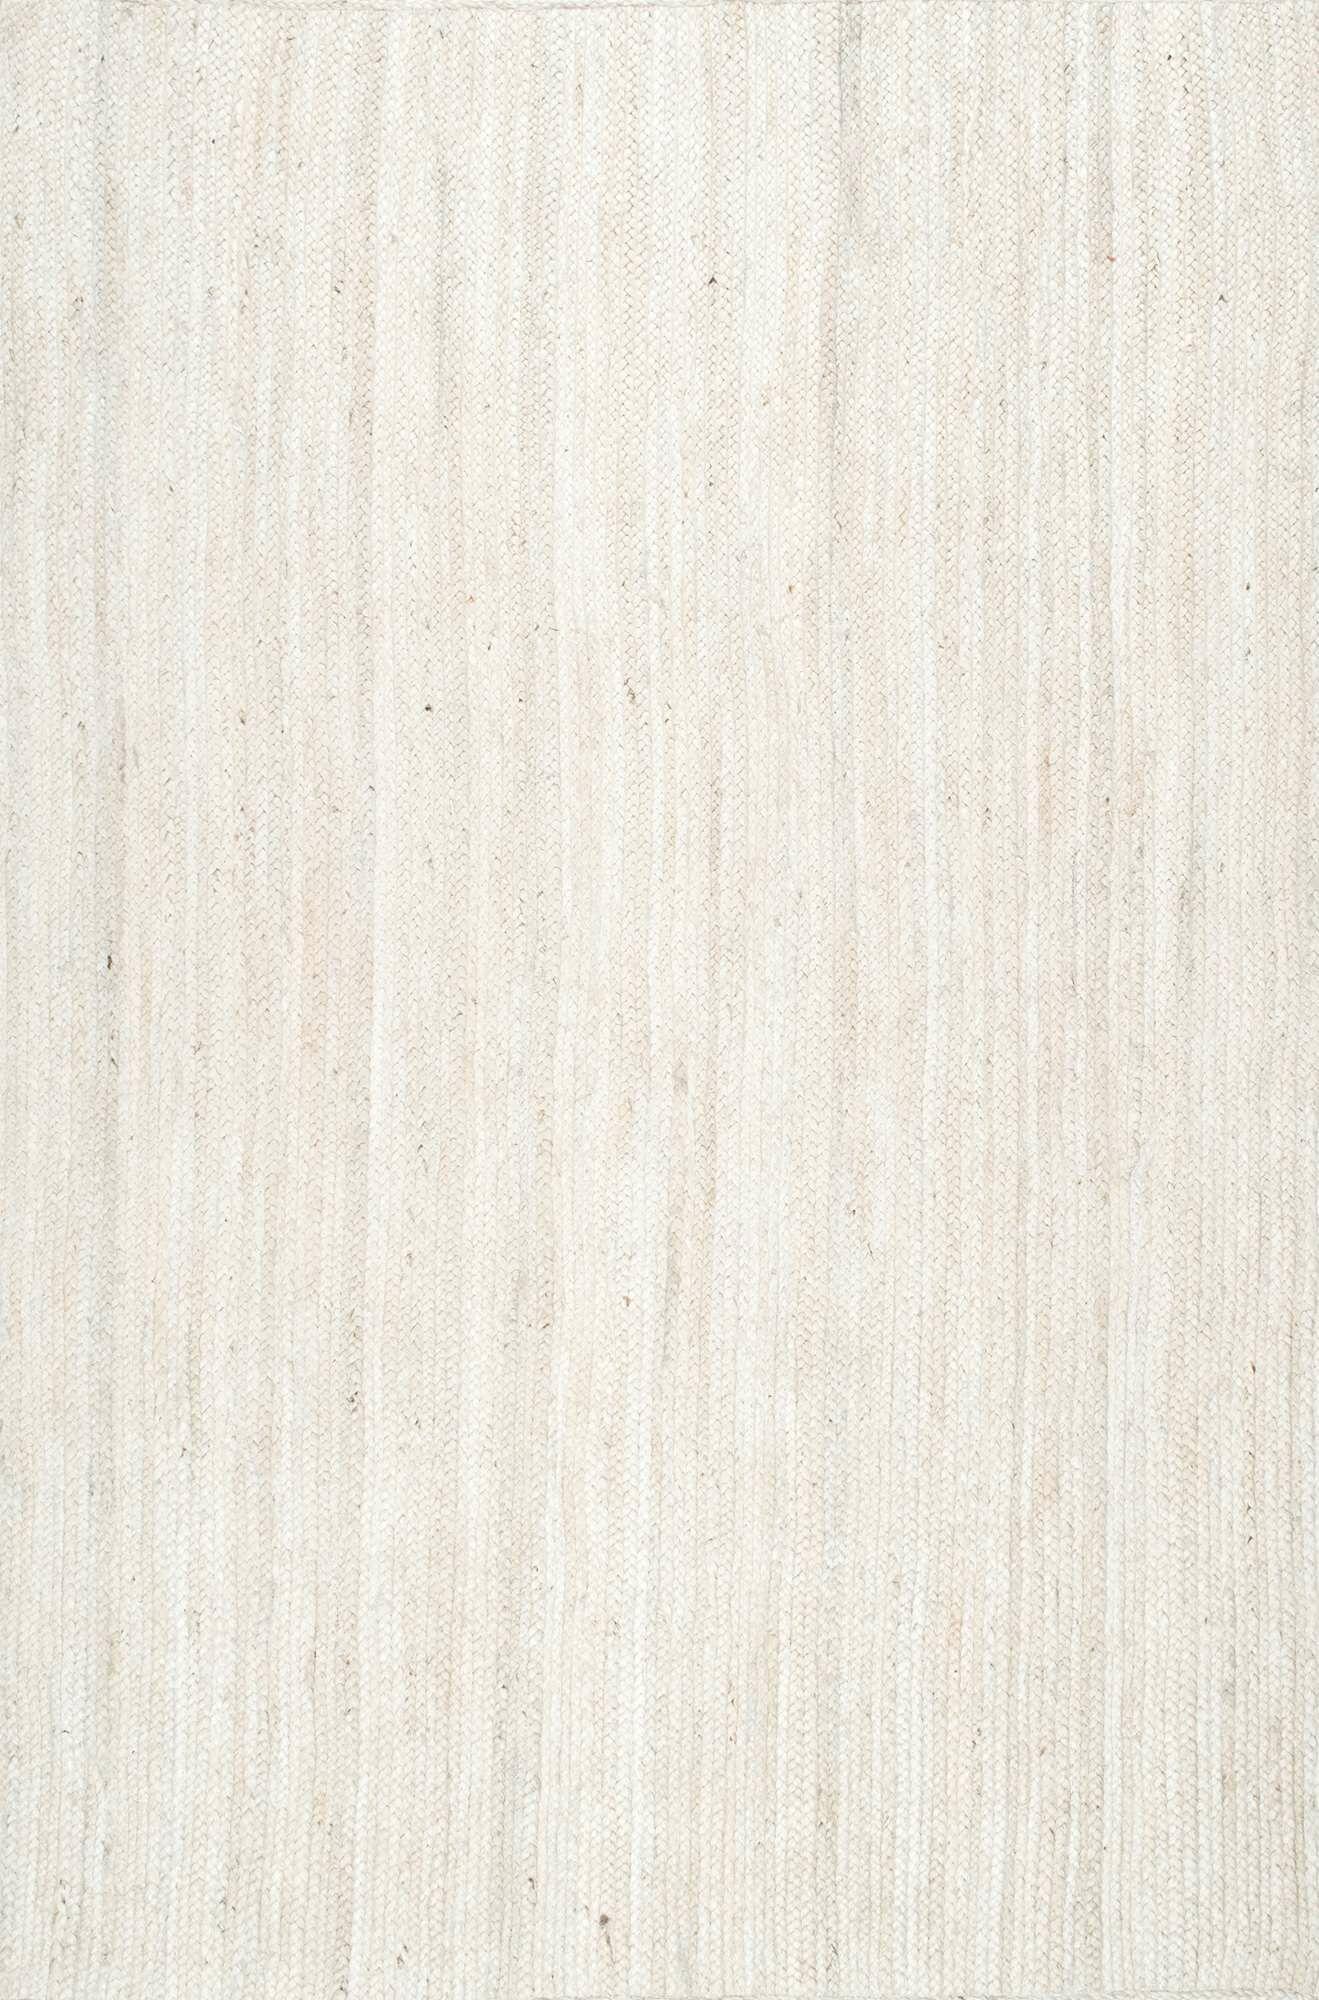 Burrillville Hand-Woven White Area Rug Rug Size: Rectangle 5' x 8'